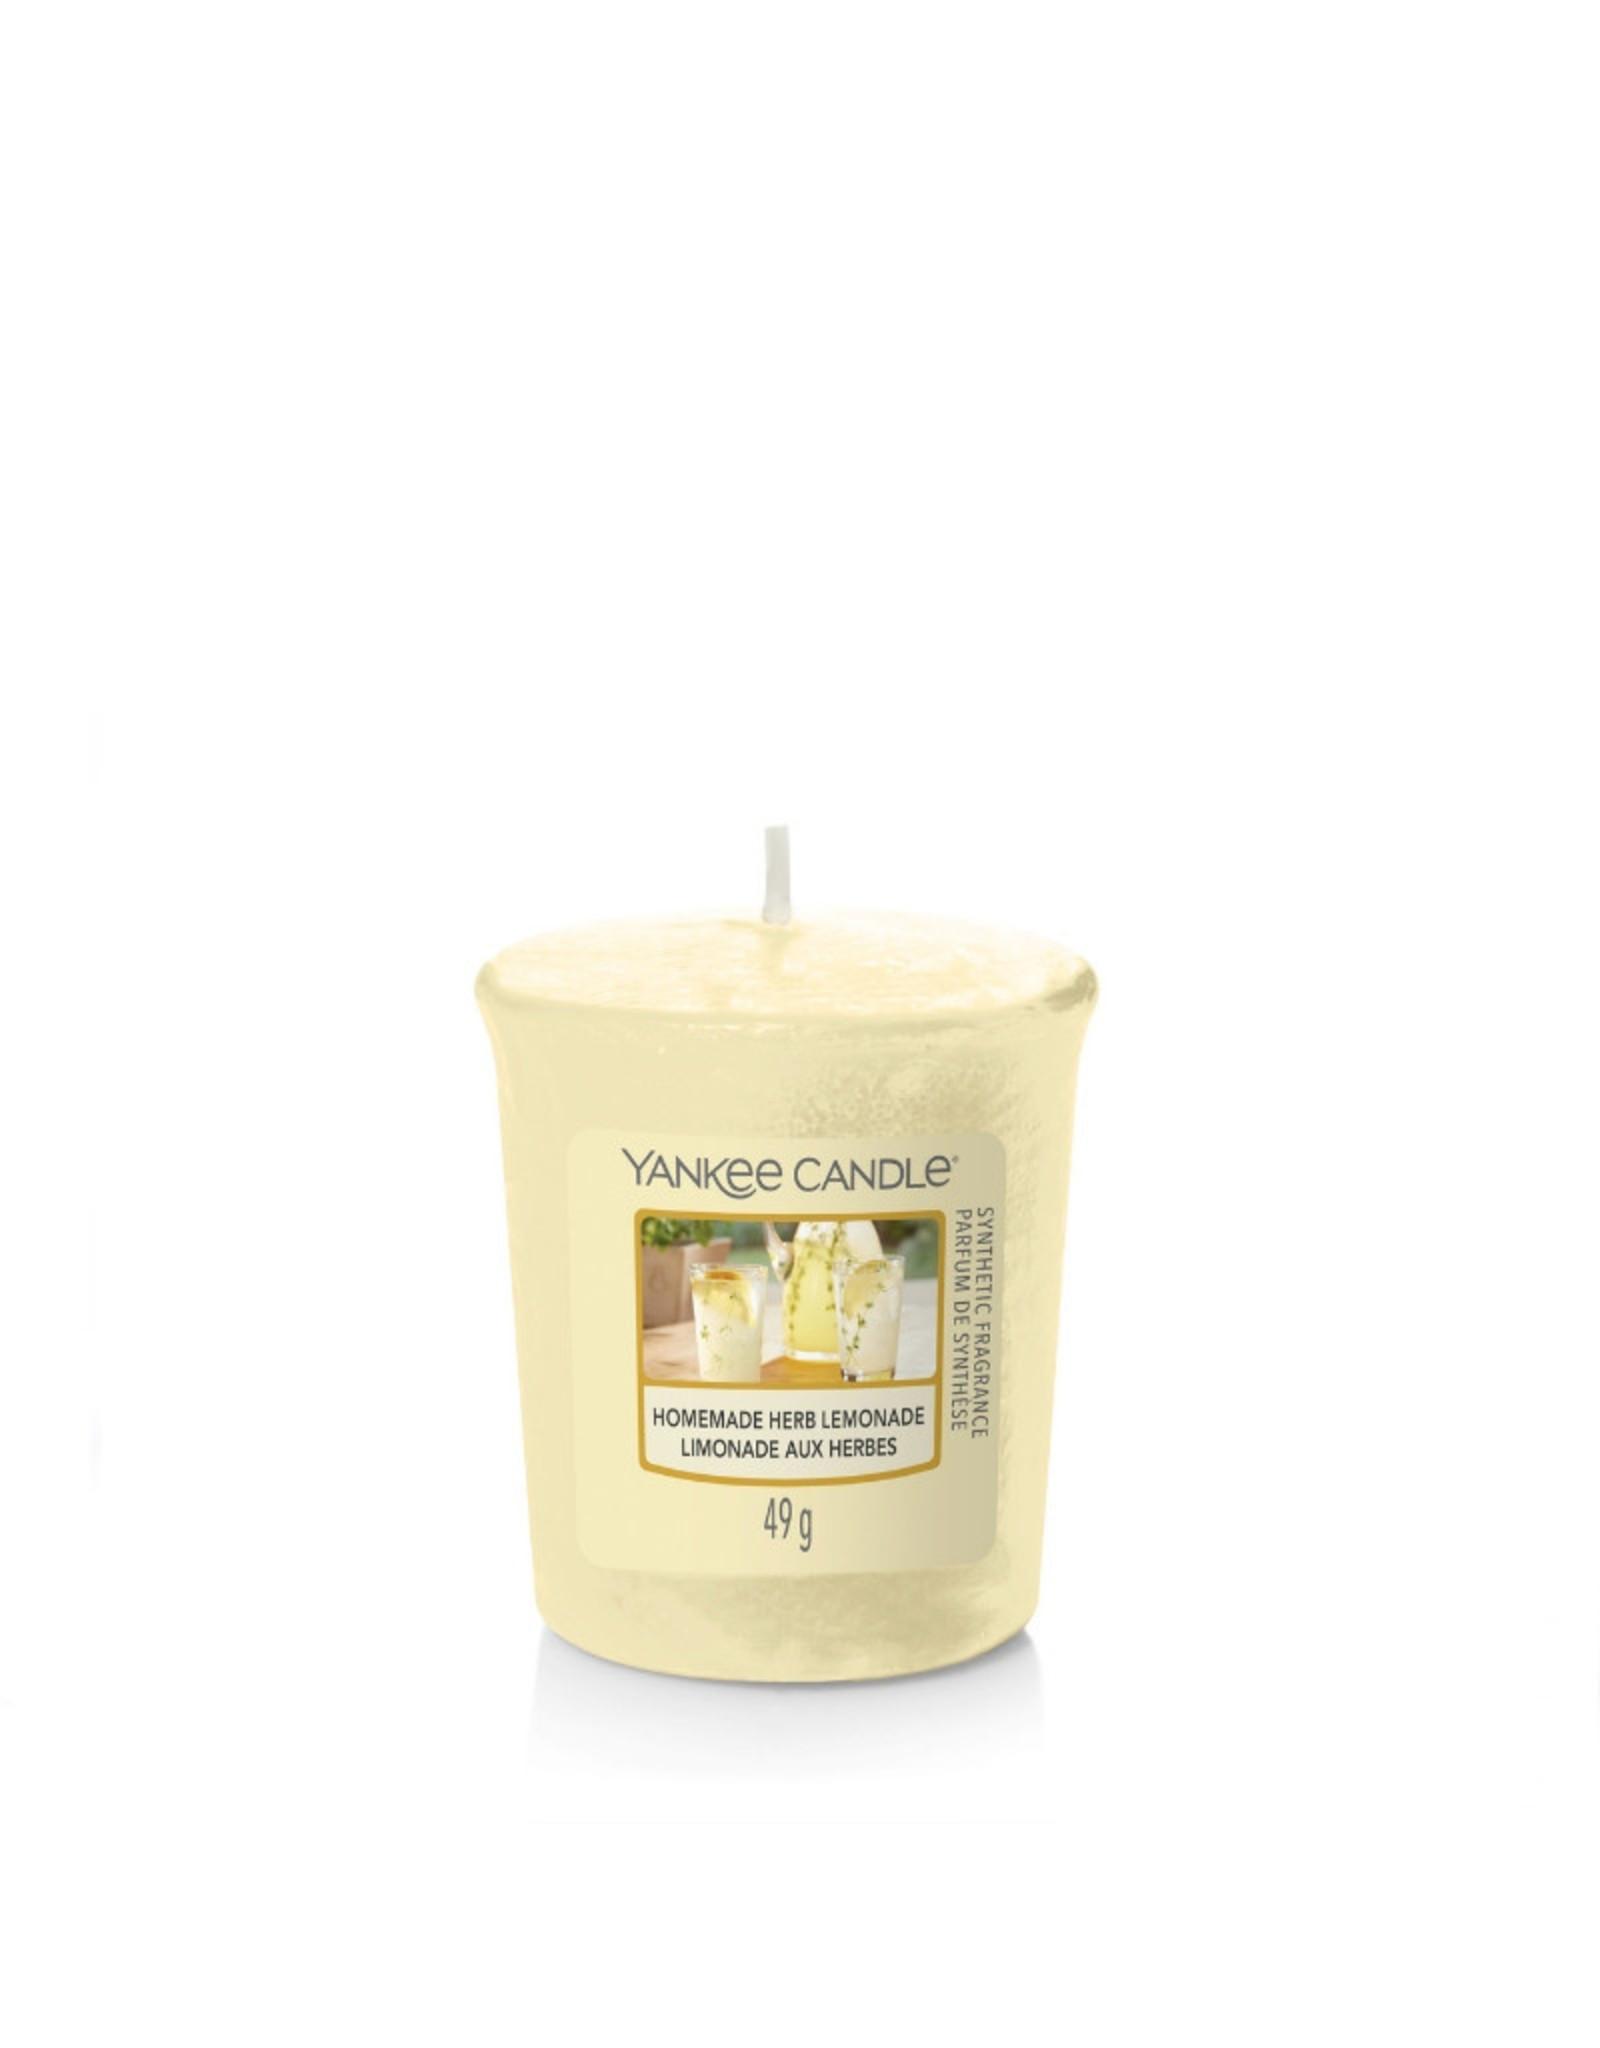 Yankee Candle Homemade Herb Lemonade - Votive